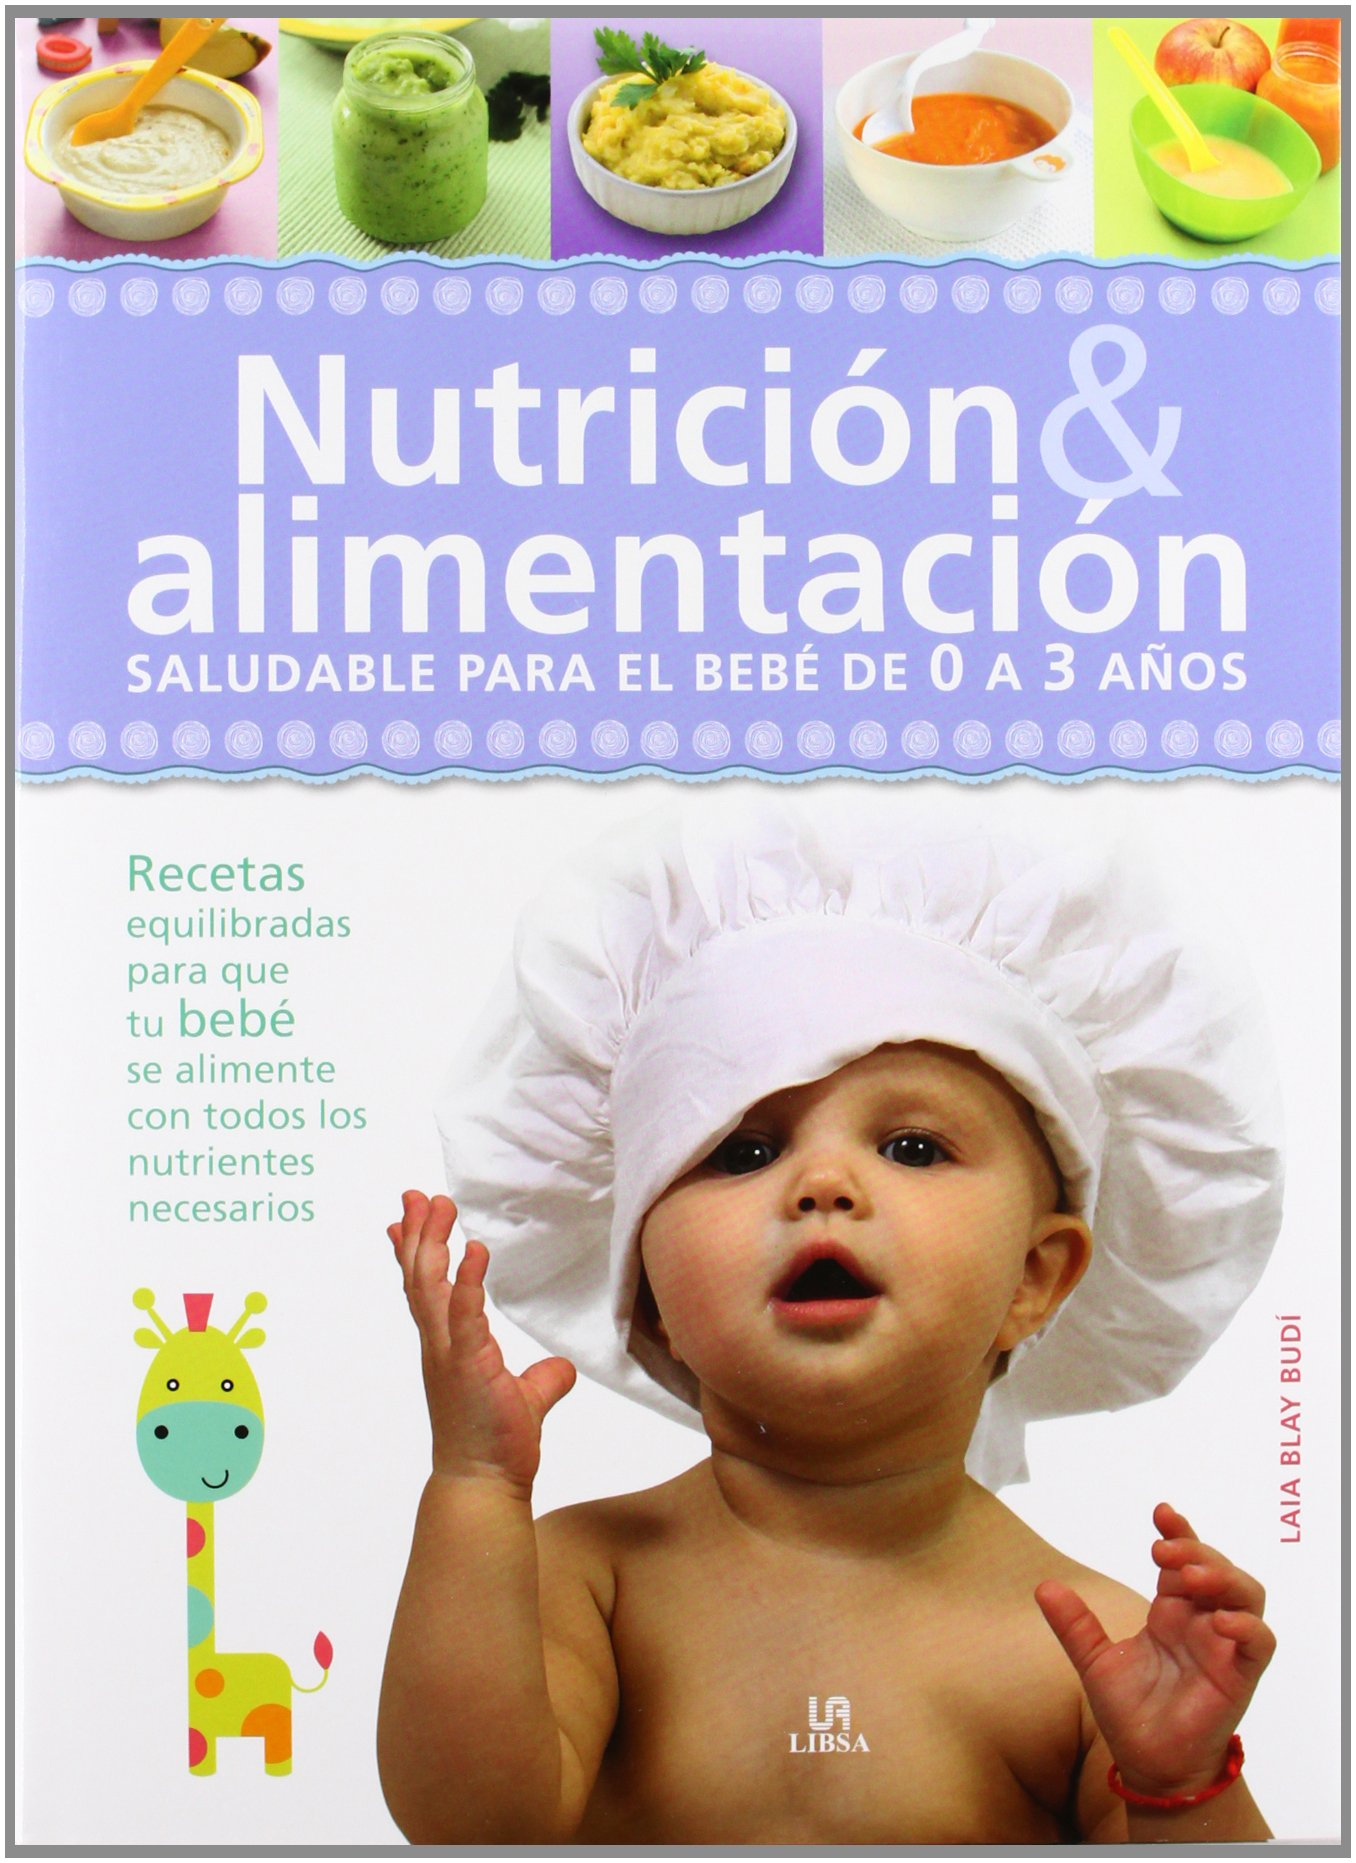 alimentacion saludable para ninos de 0 a 3 anos